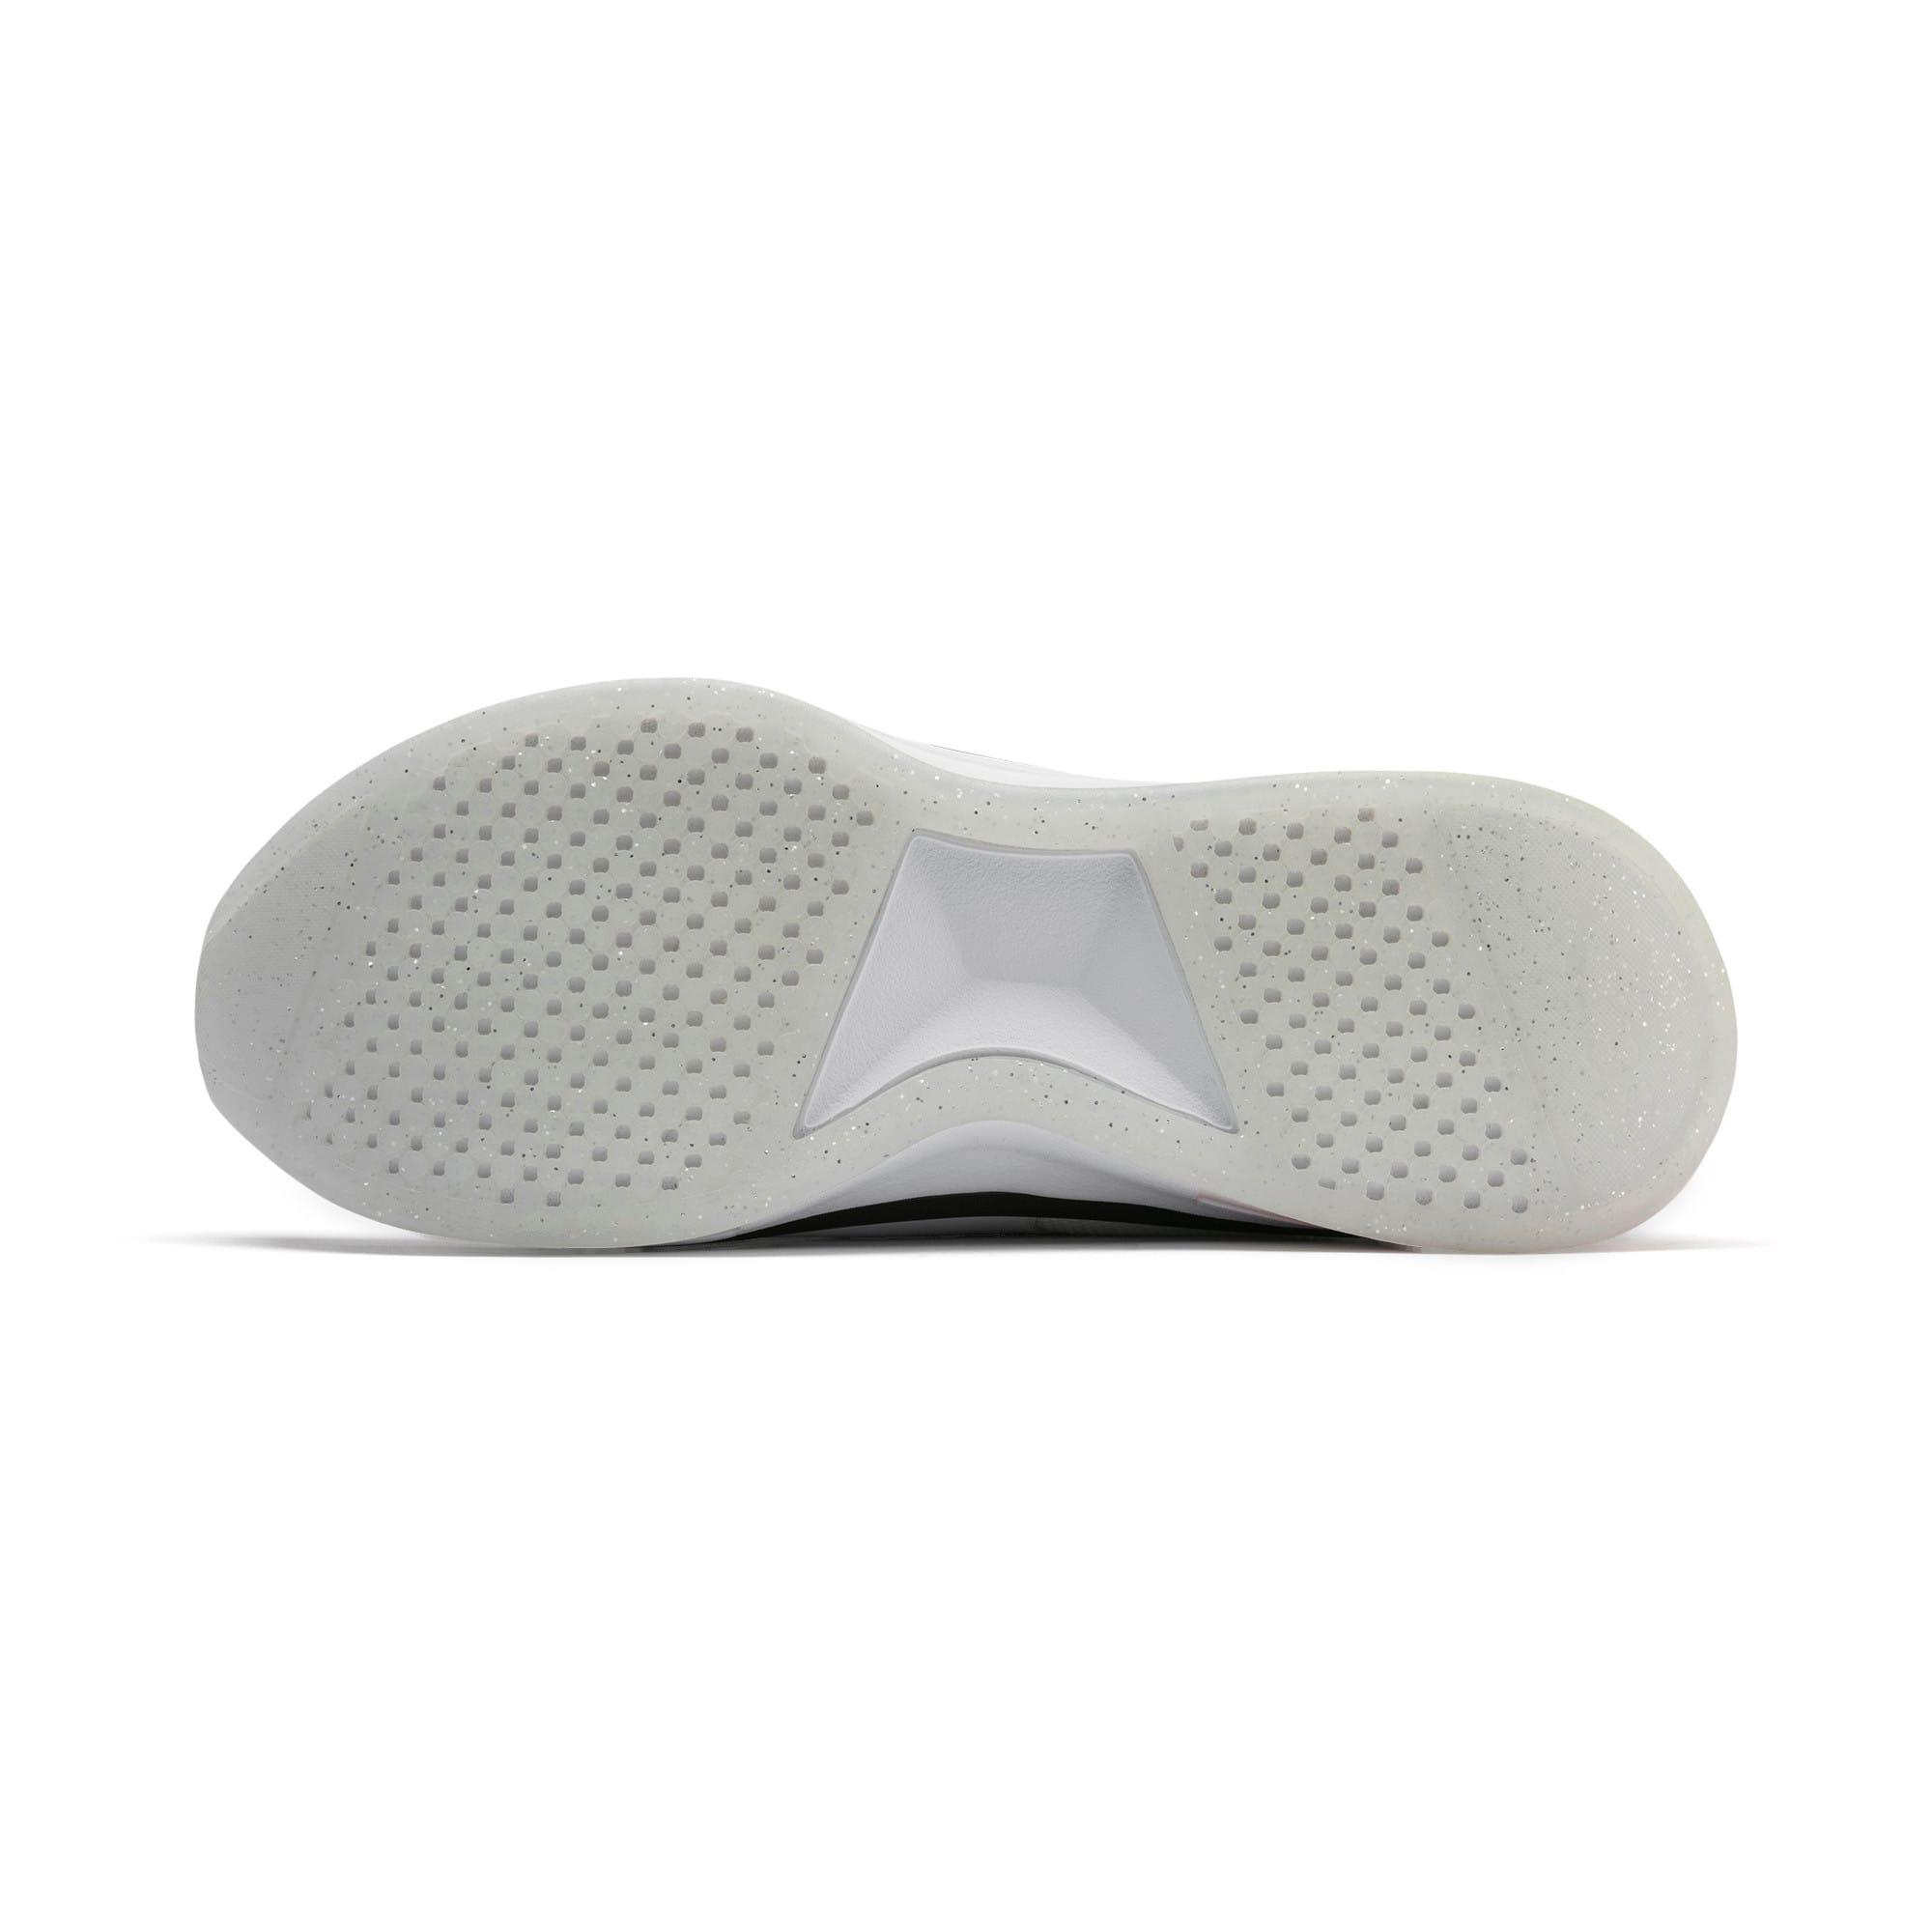 Thumbnail 5 of SG Slip-On Glitz Women's Training Shoes, Puma White-Puma Black, medium